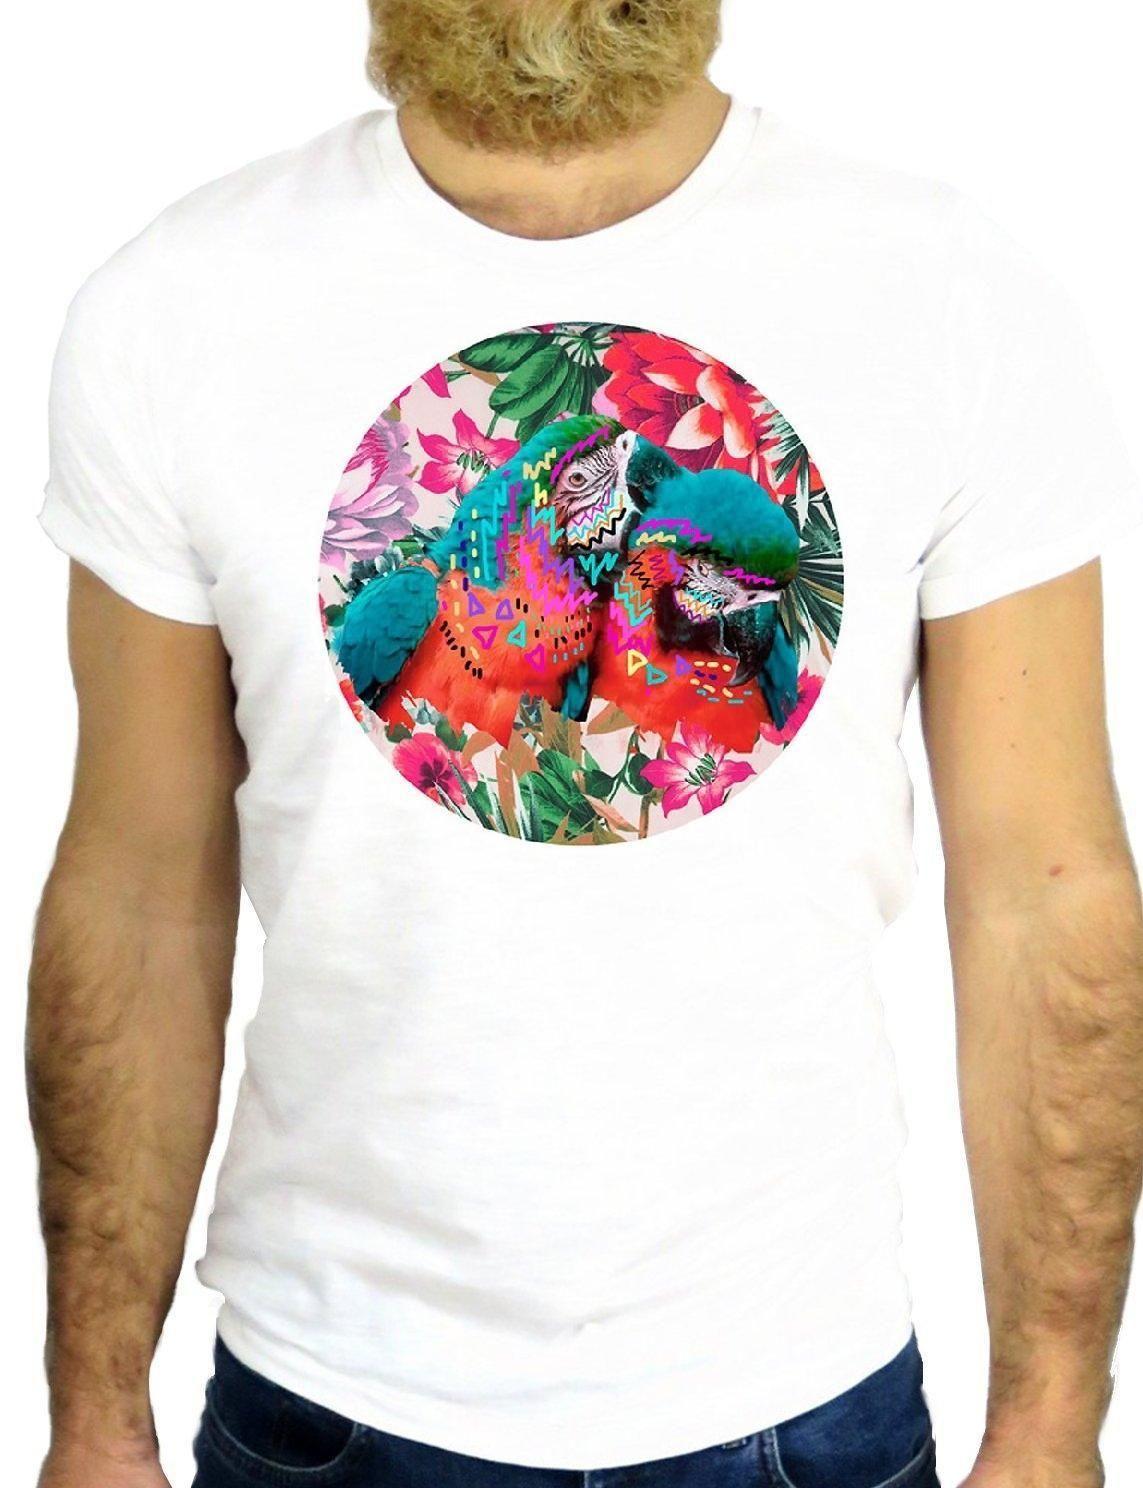 Color Bird Camiseta Parrot Flor Nice Z2459 Cool Compre deBroCx